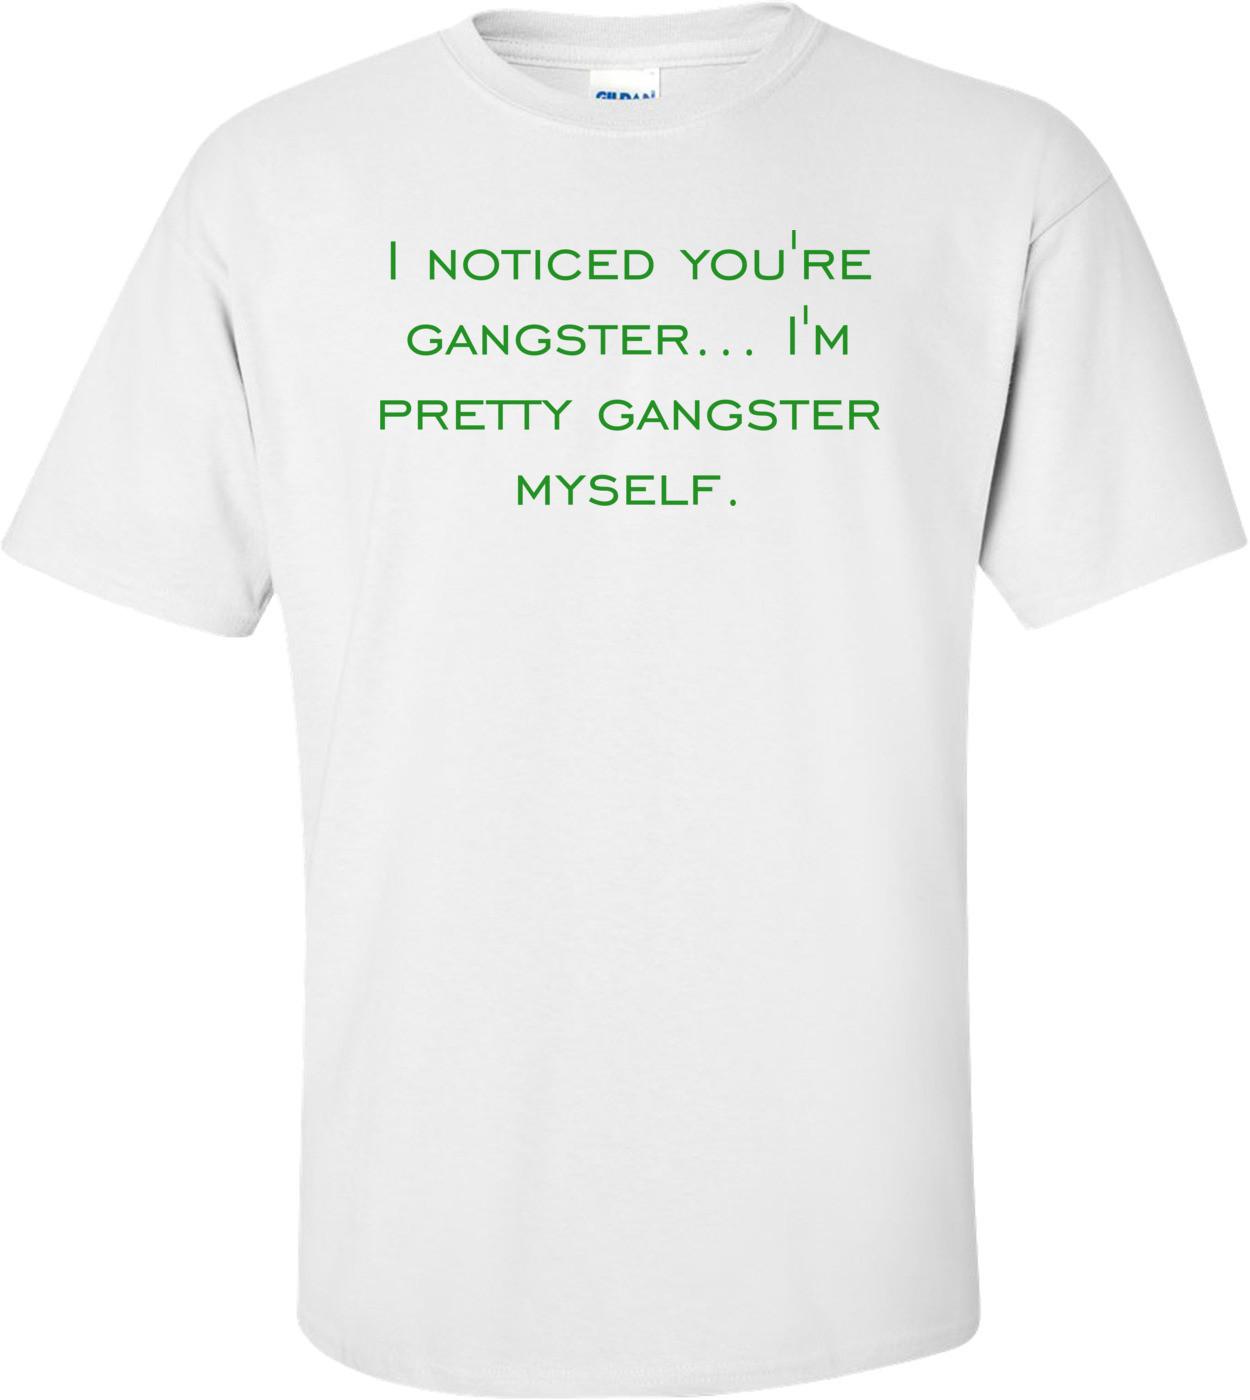 I noticed you're gangster... I'm pretty gangster myself. Shirt